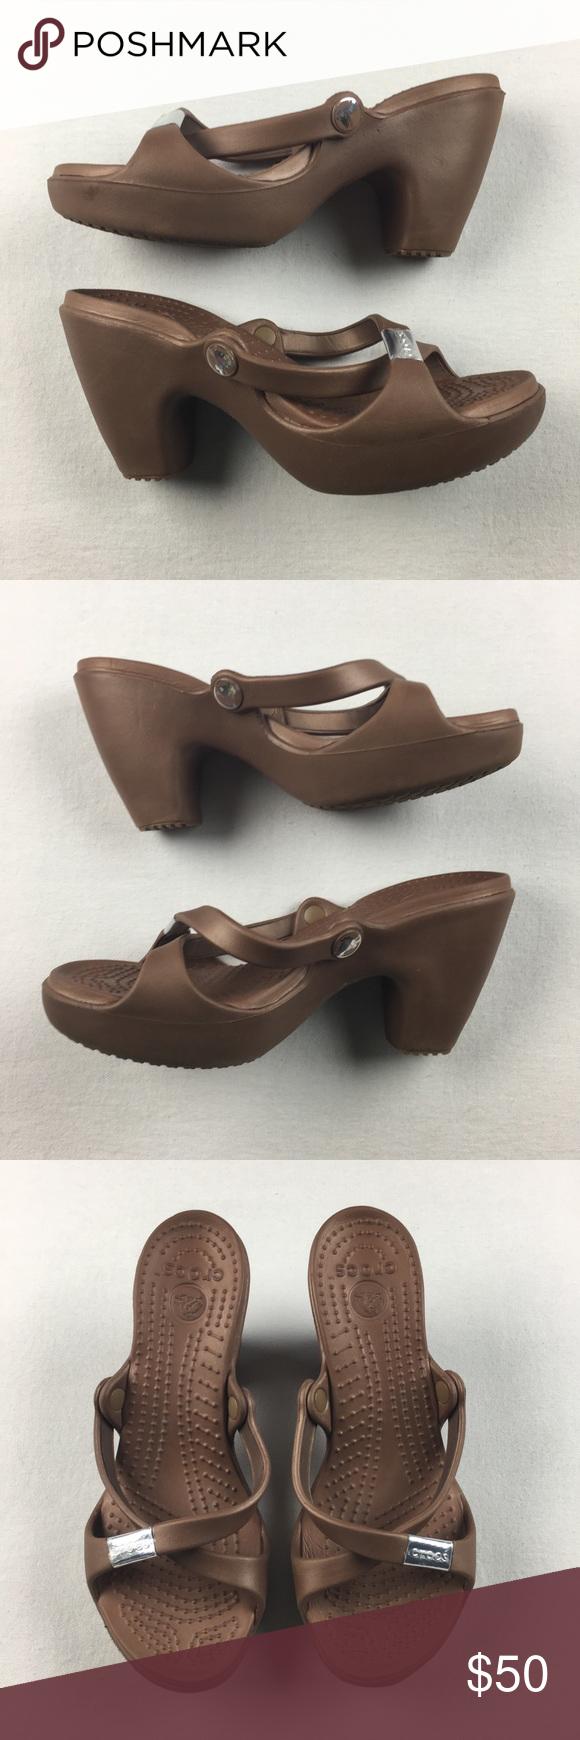 Crocs Cyprus Wmns 6 Heel Strappy Sandals